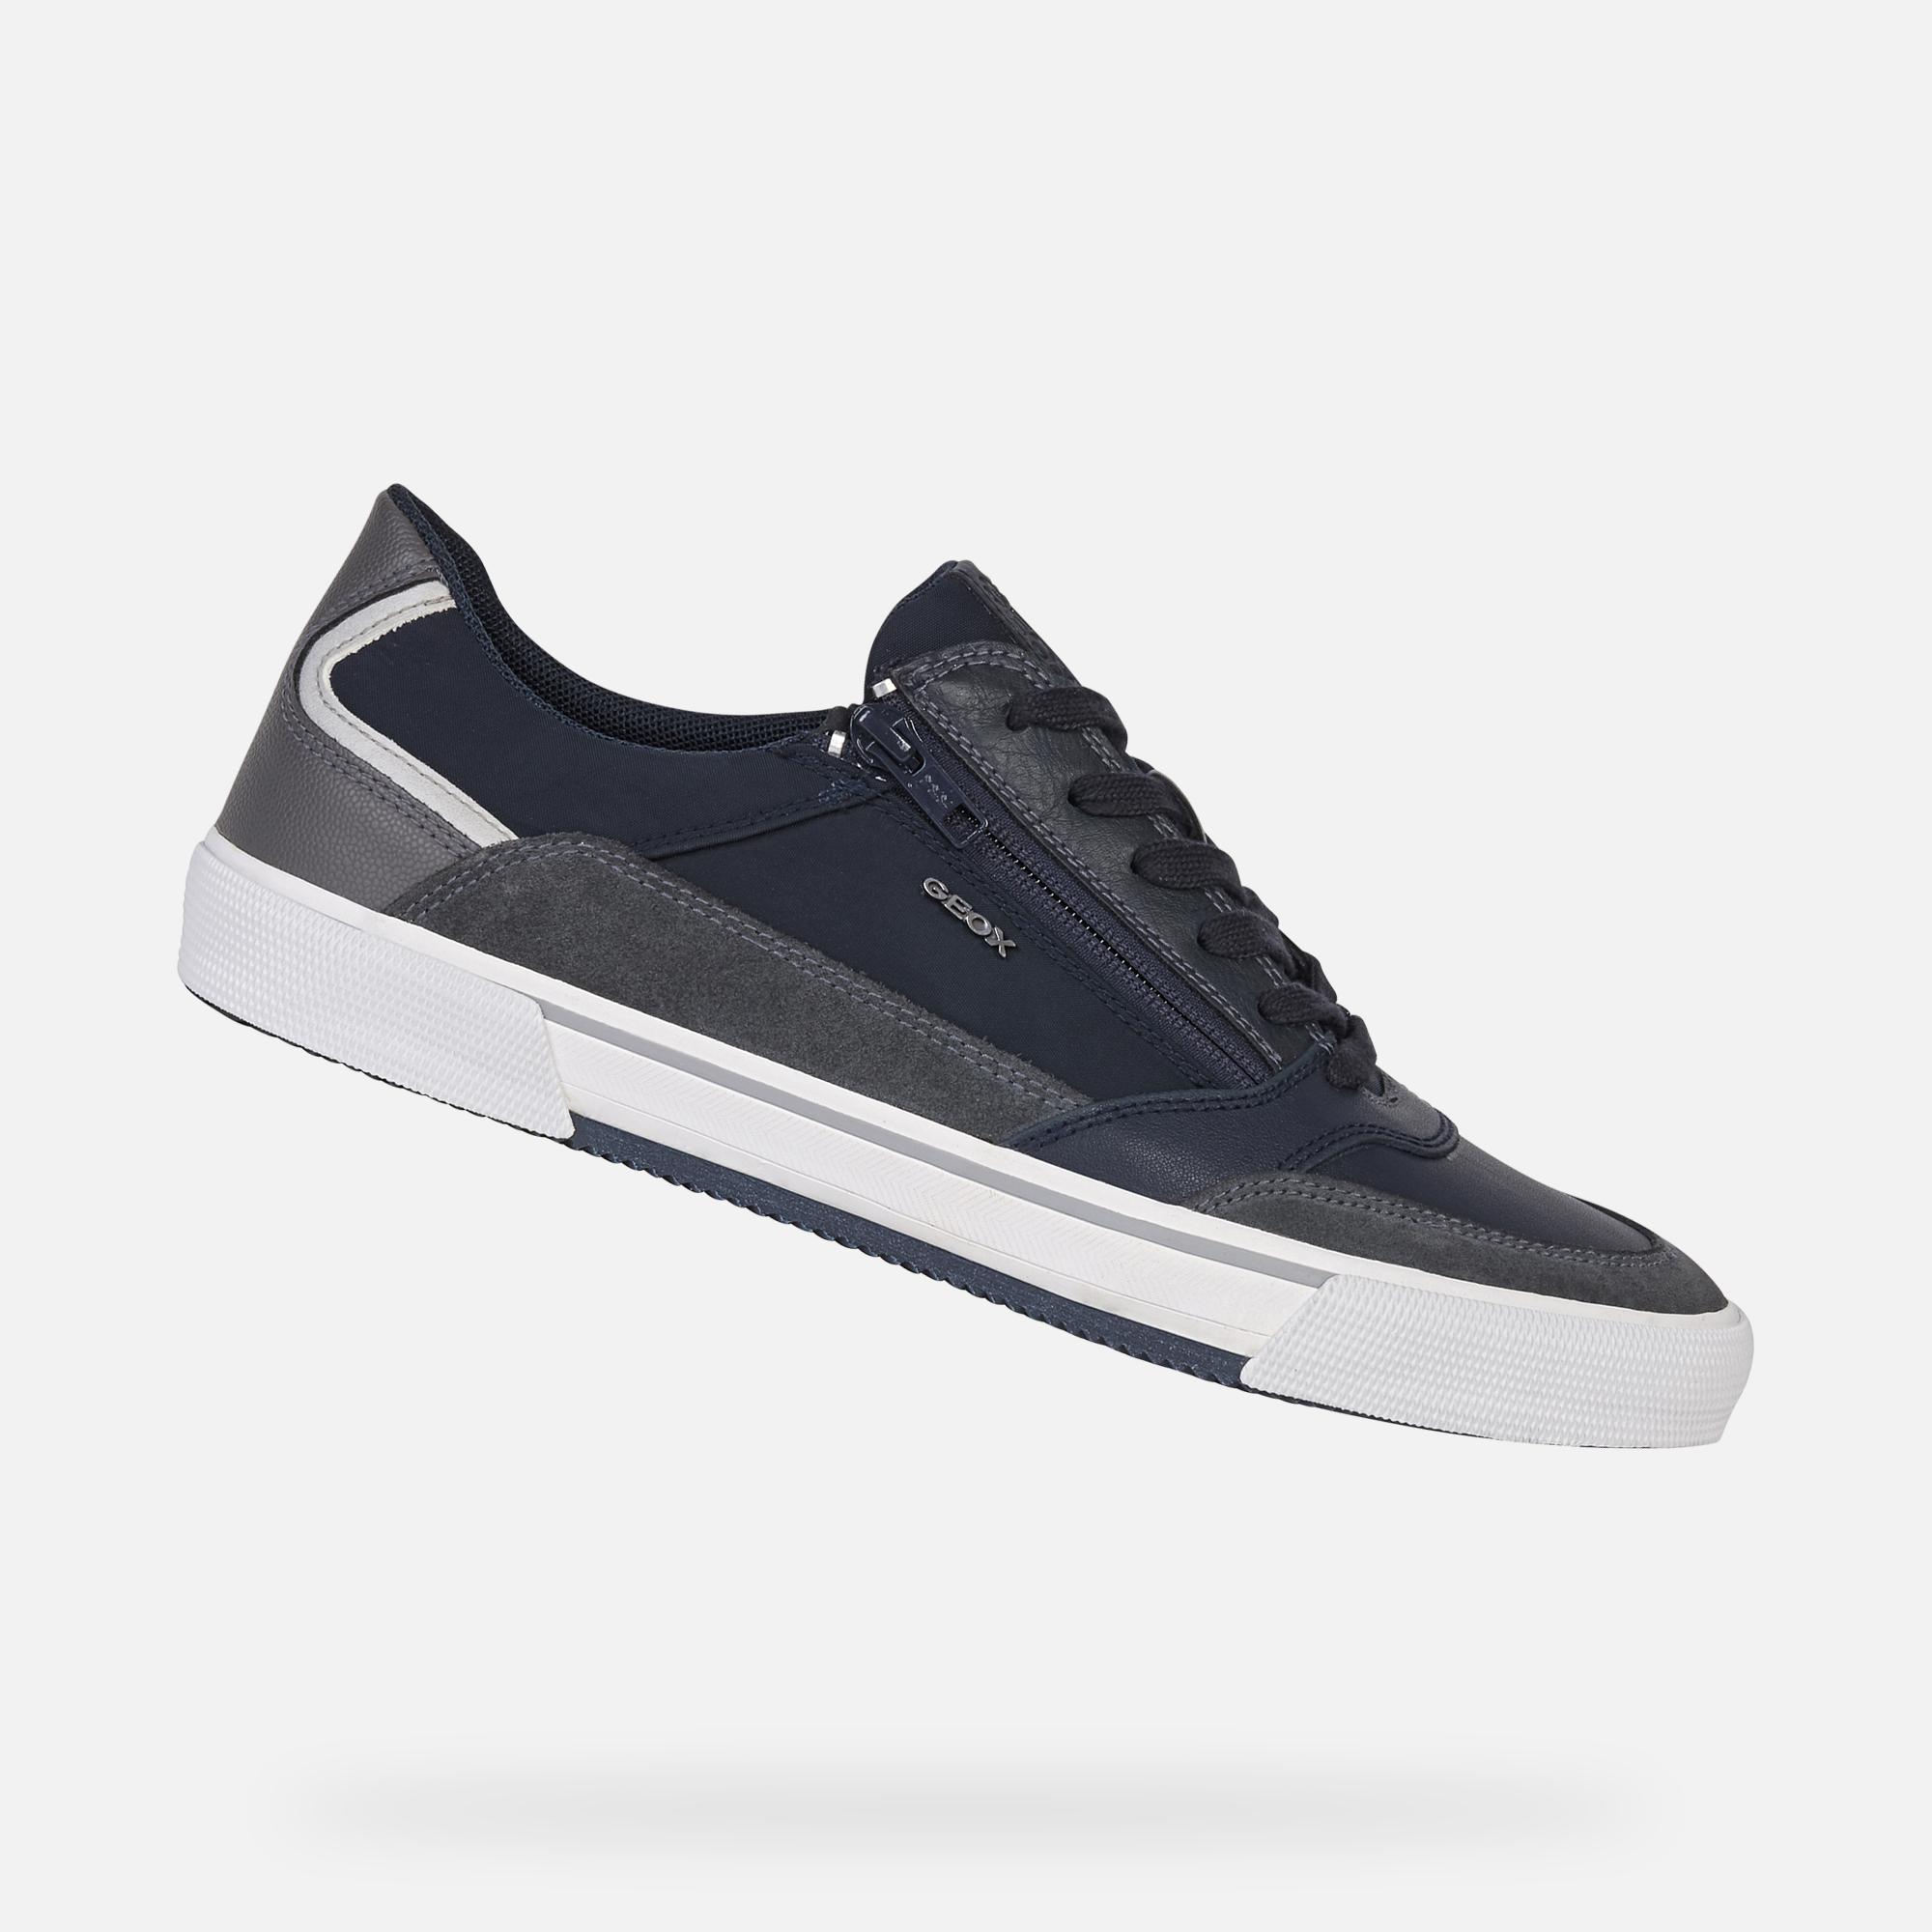 Geox U Kaven E Chaussures Hommes High Top Sneaker Lacets Black u046me022mec9997